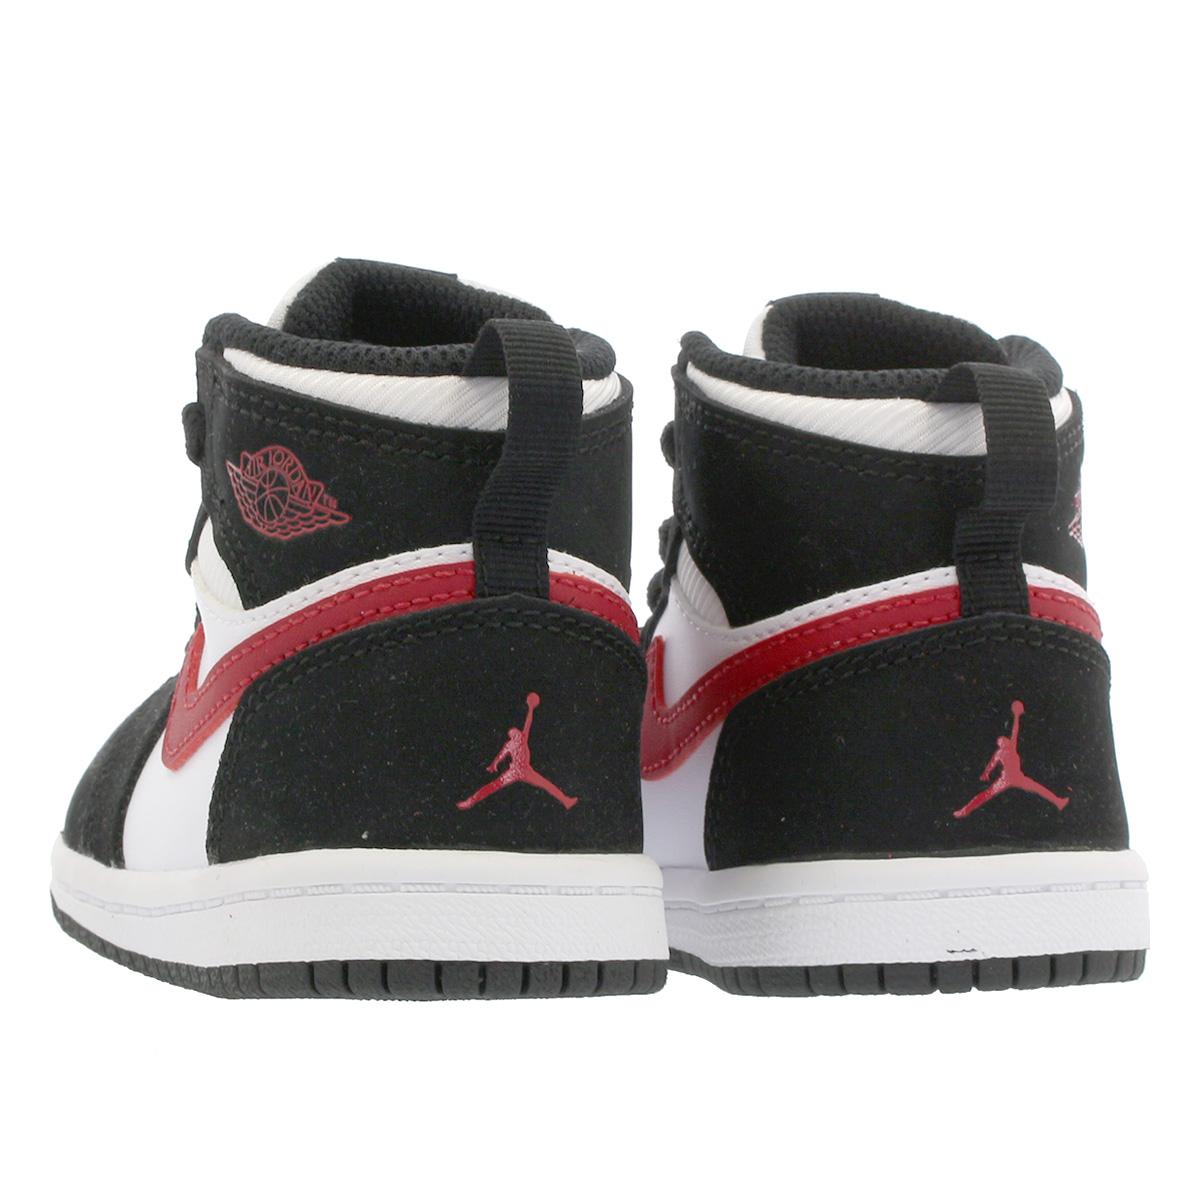 95ebe8ff4ce8dd 1 NIKE AIR JORDAN RETRO 1 HI BT Nike Air Jordan nostalgic high BT BLACK GYM  RED WHITE 705